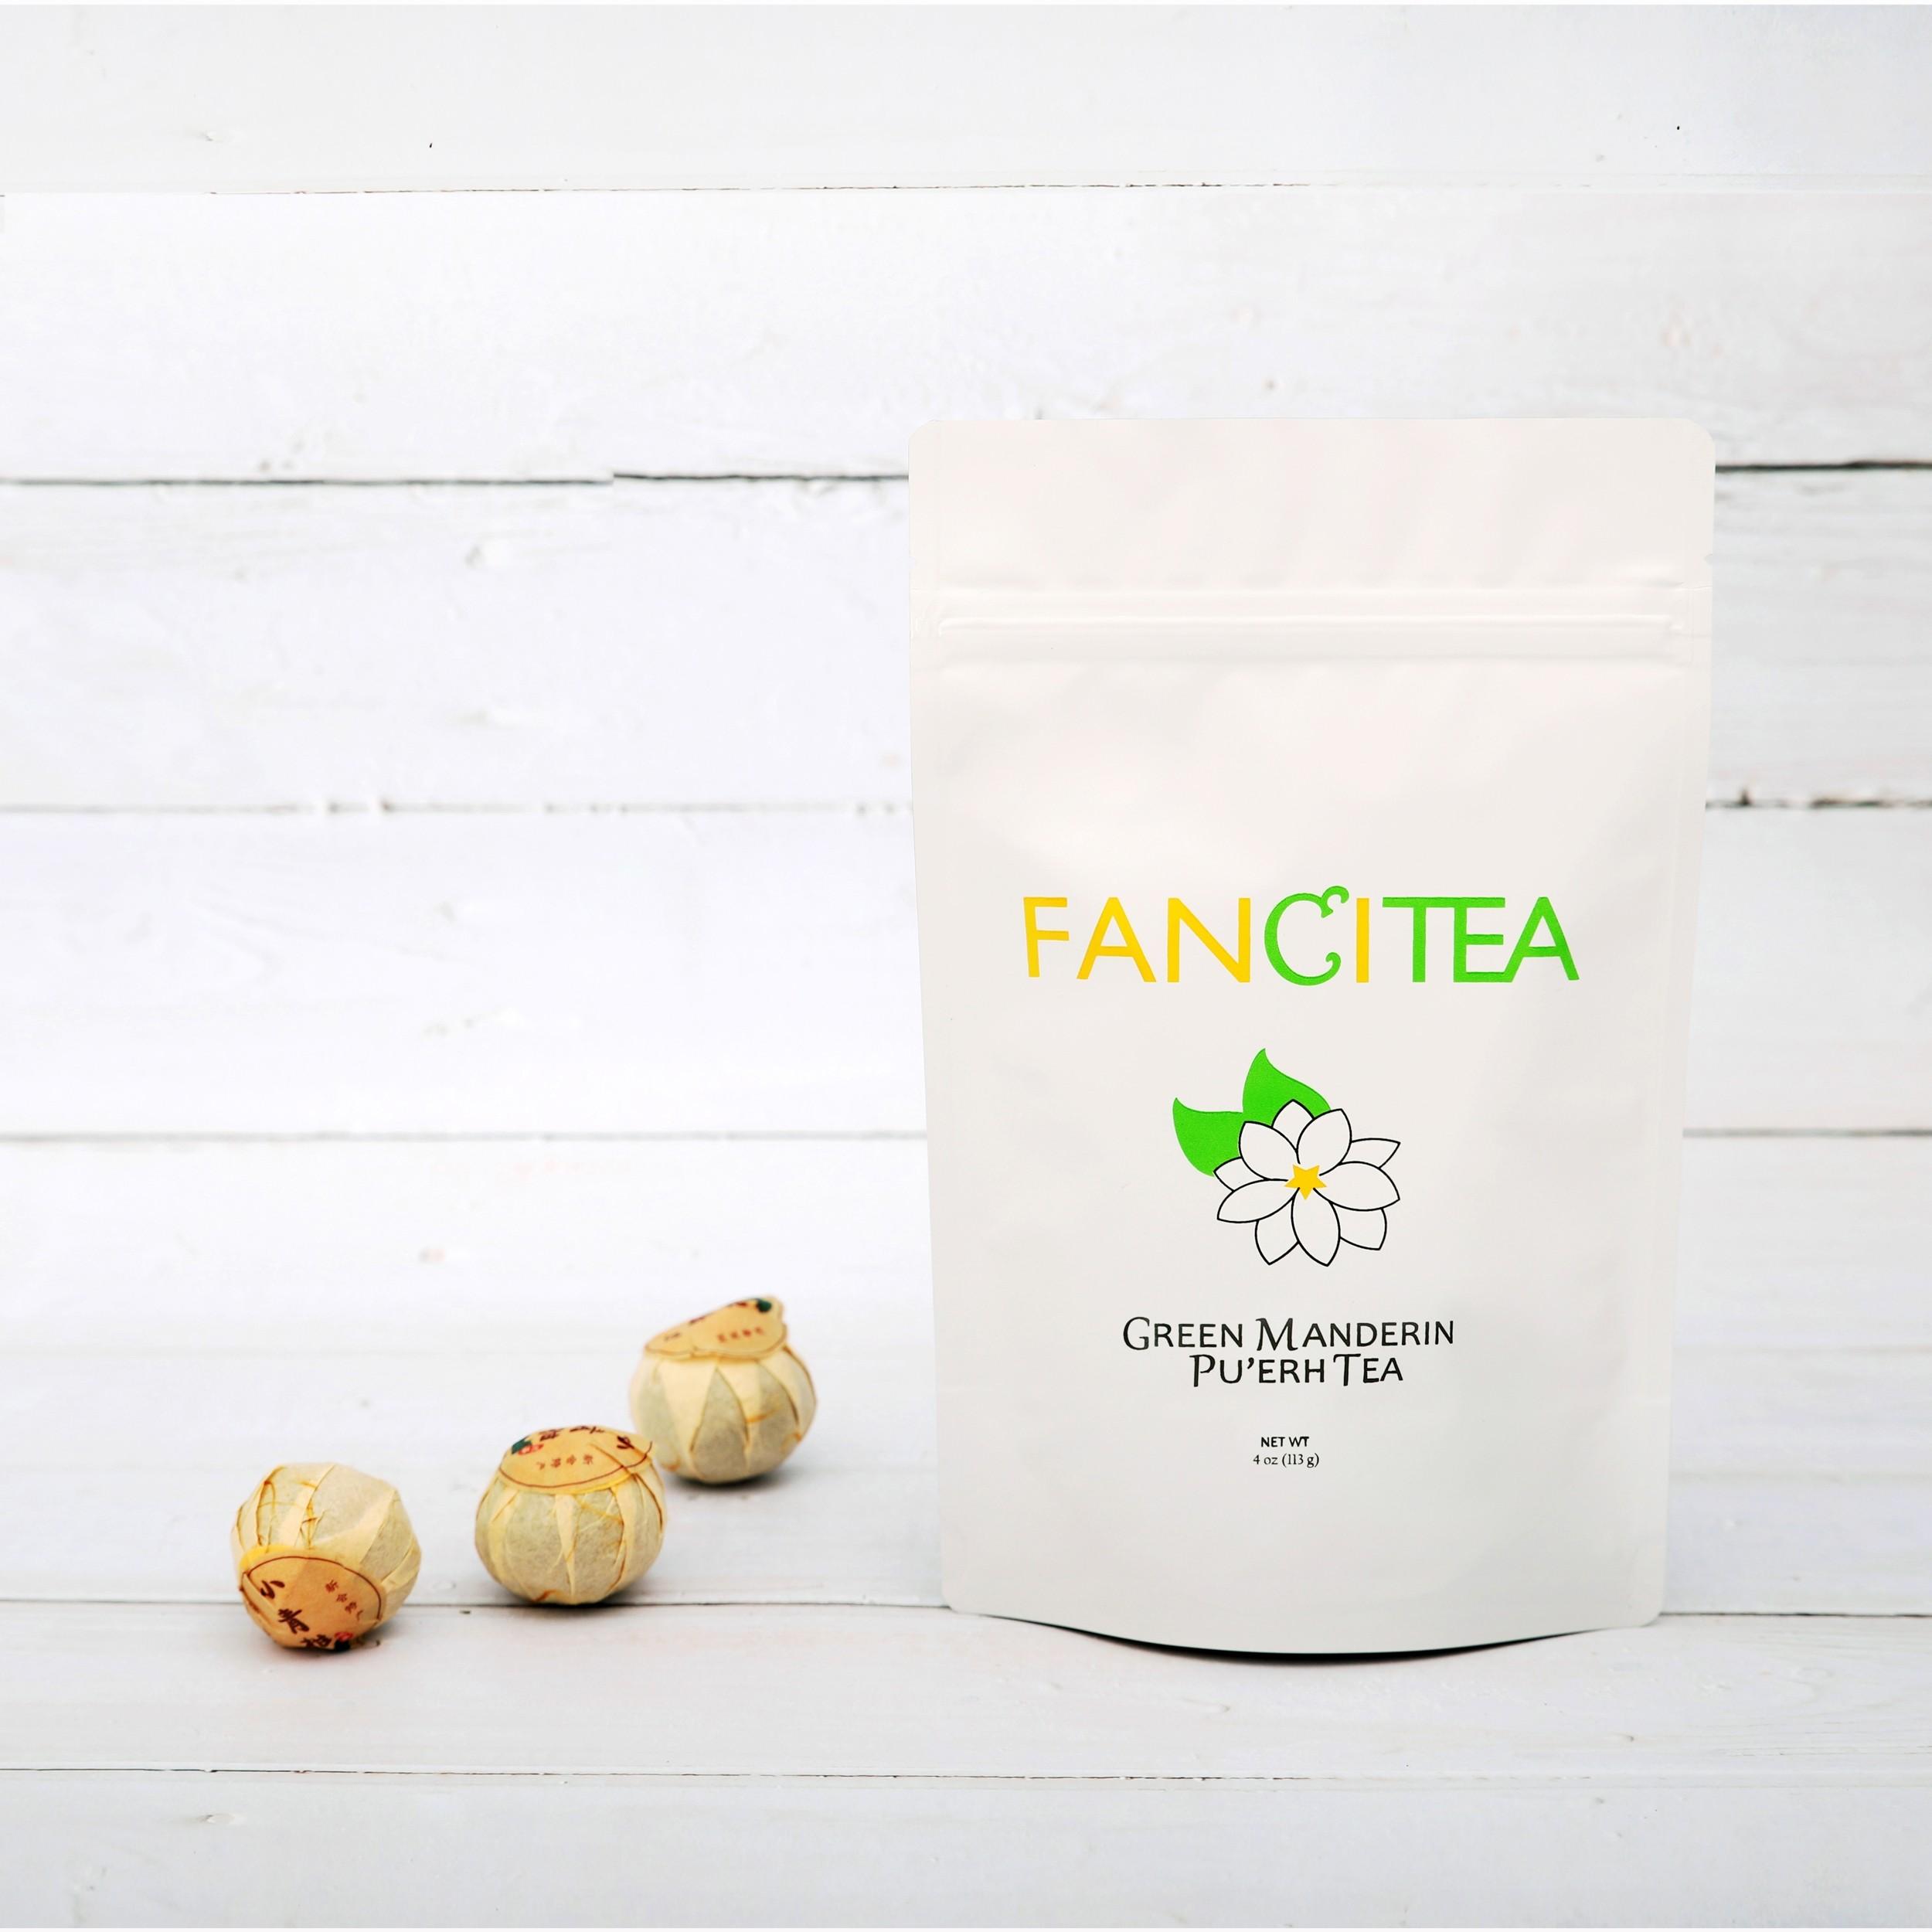 Fancitea High Quality Chinese Pu'erh Tea With Ripe Green Mandarin 16oz